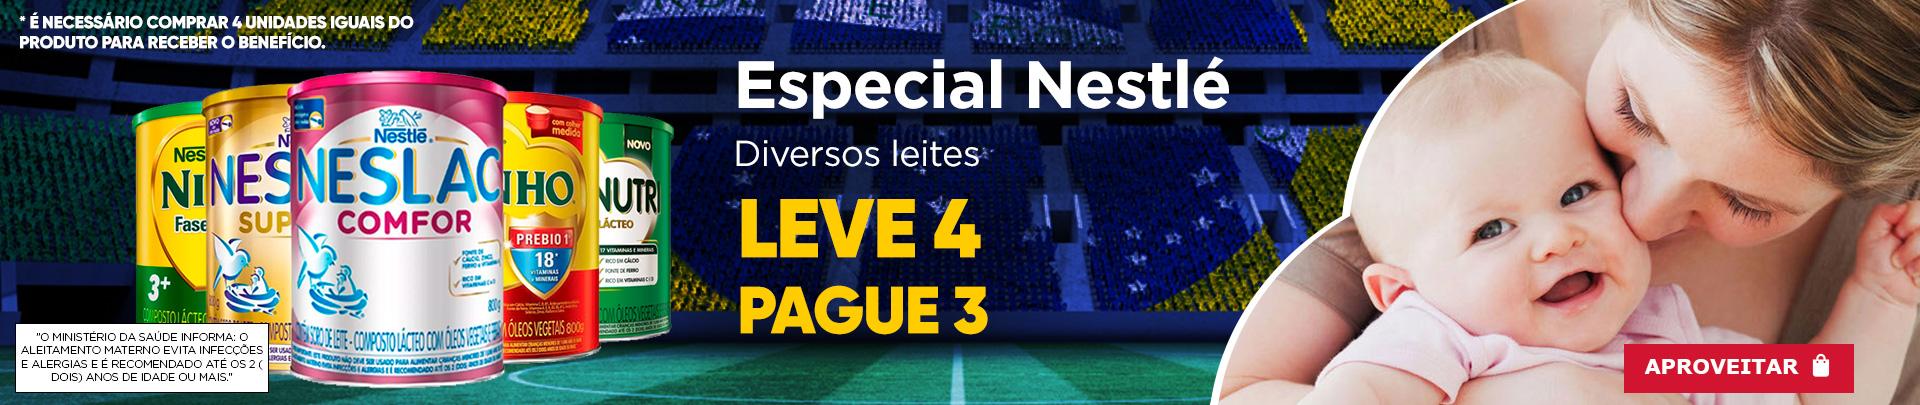 Nestle l4p3